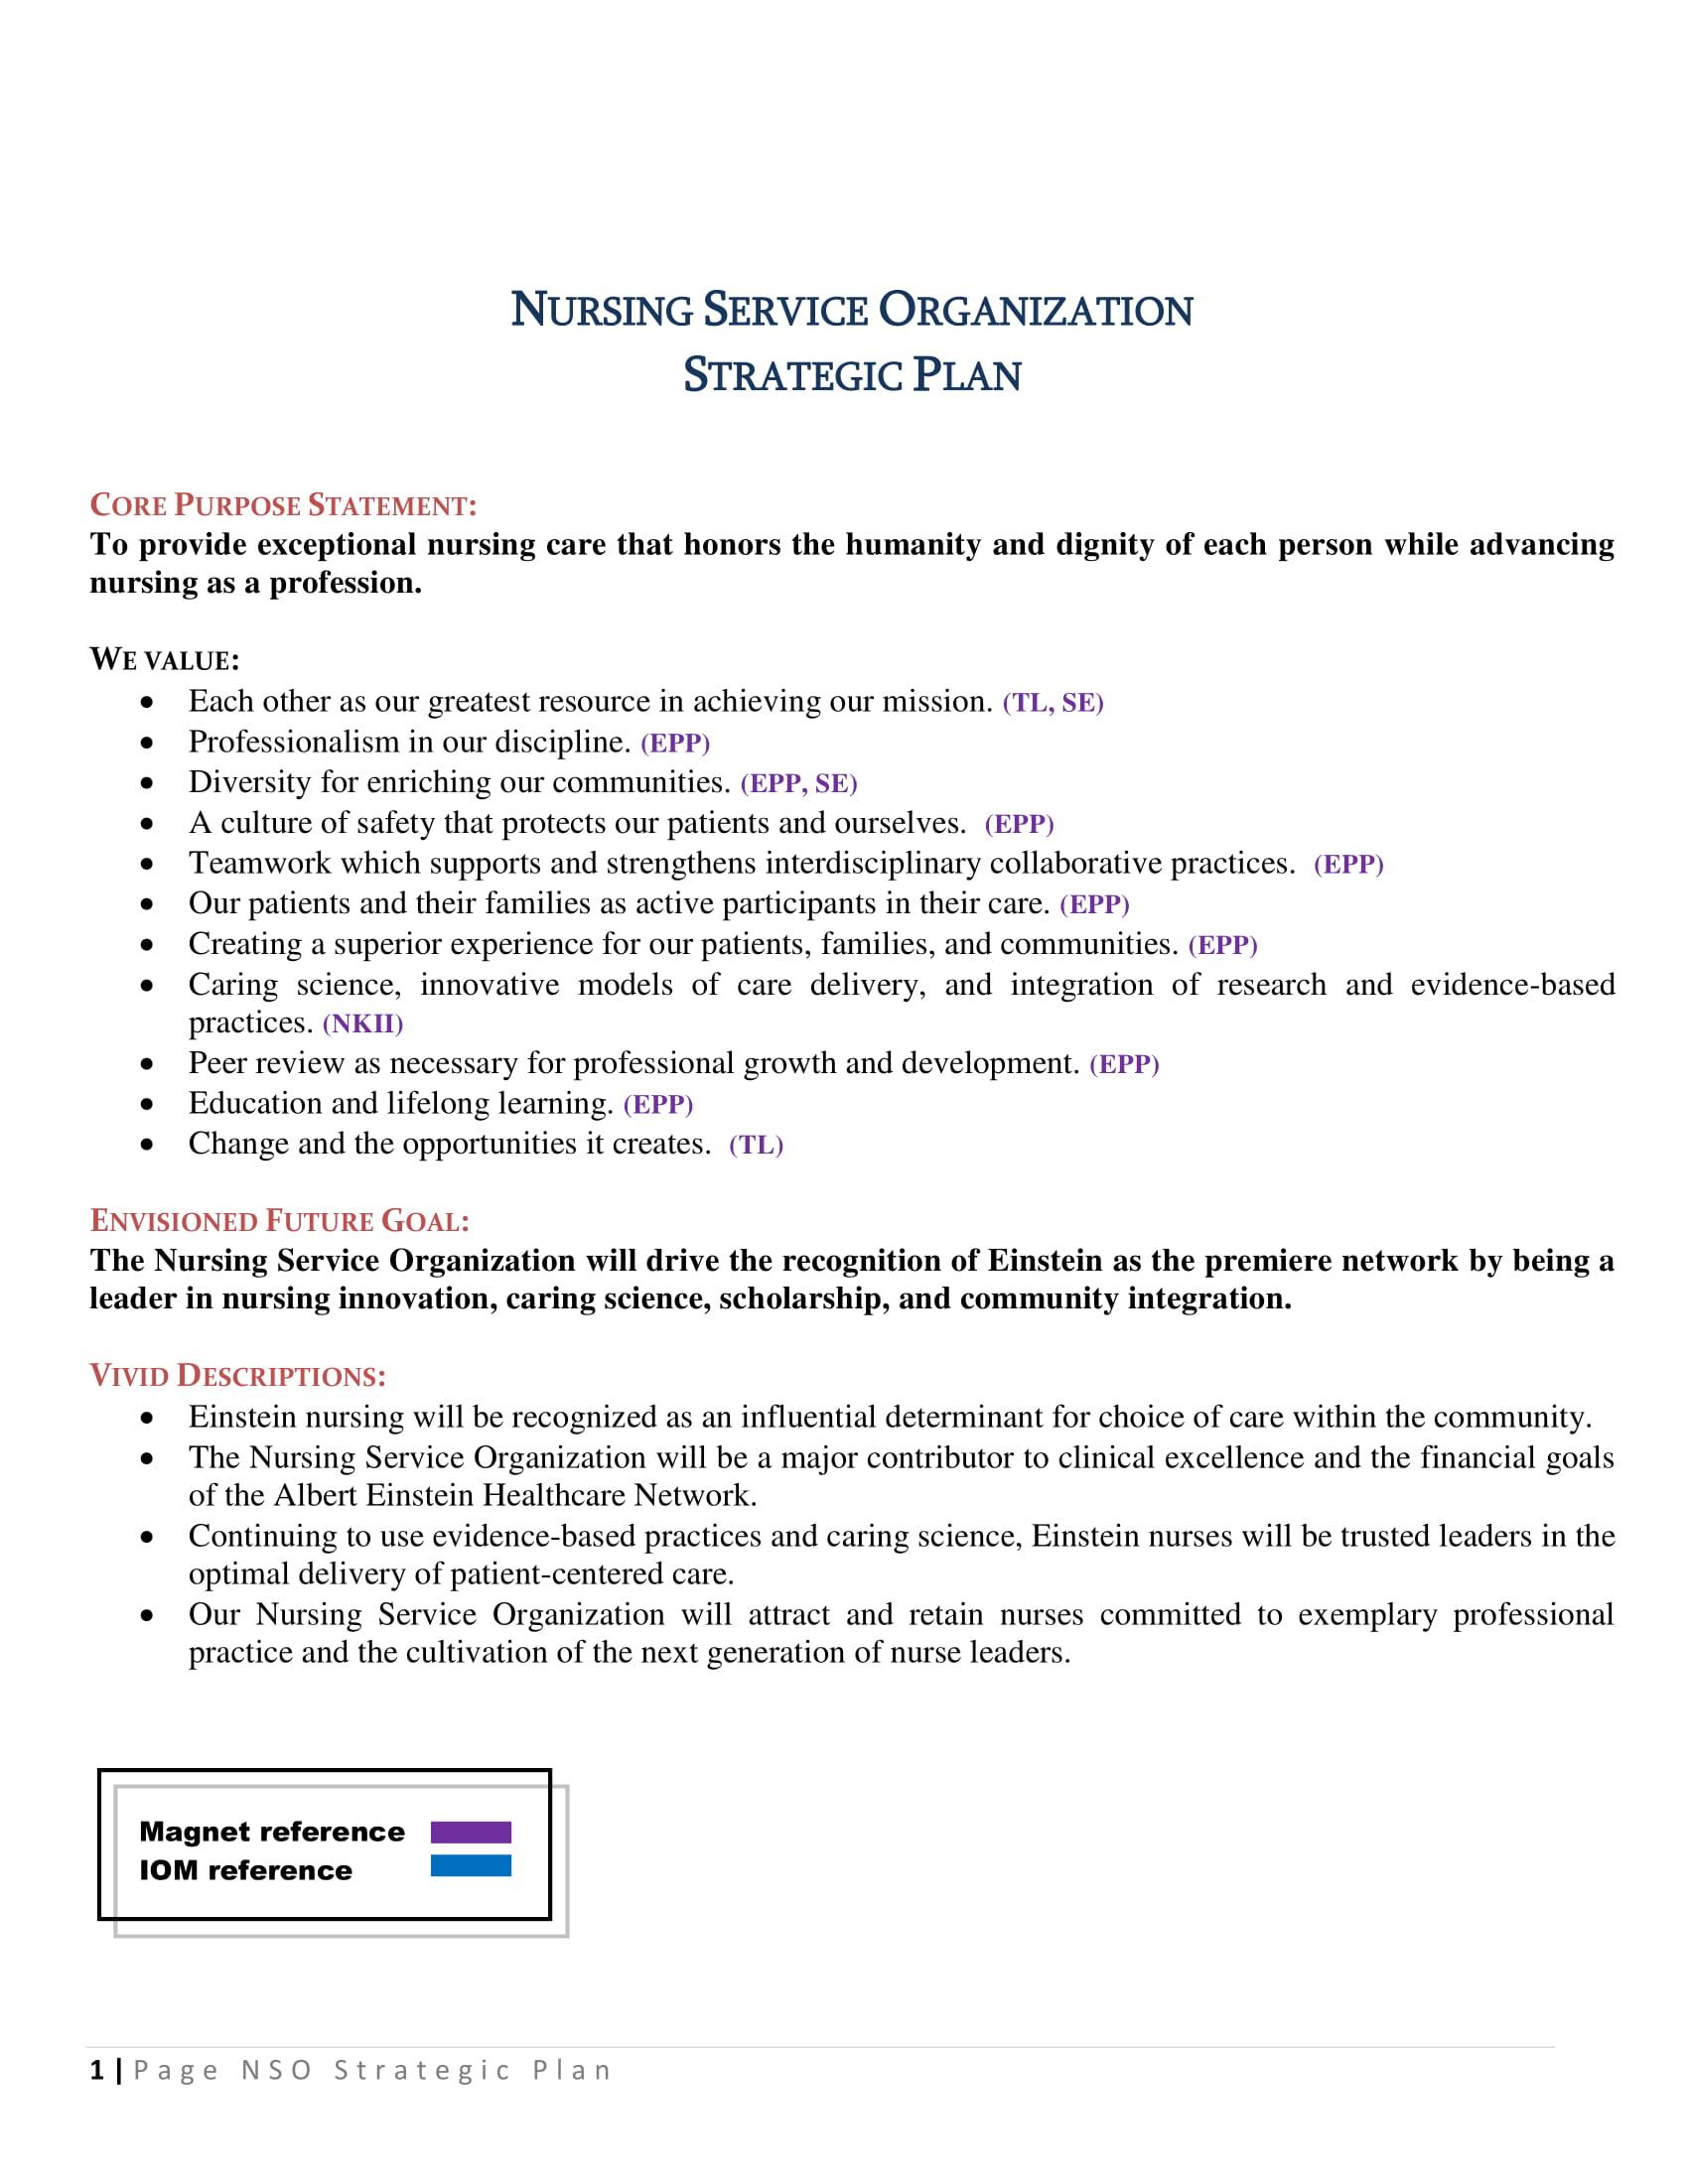 nursing service organization strategic plan example 1